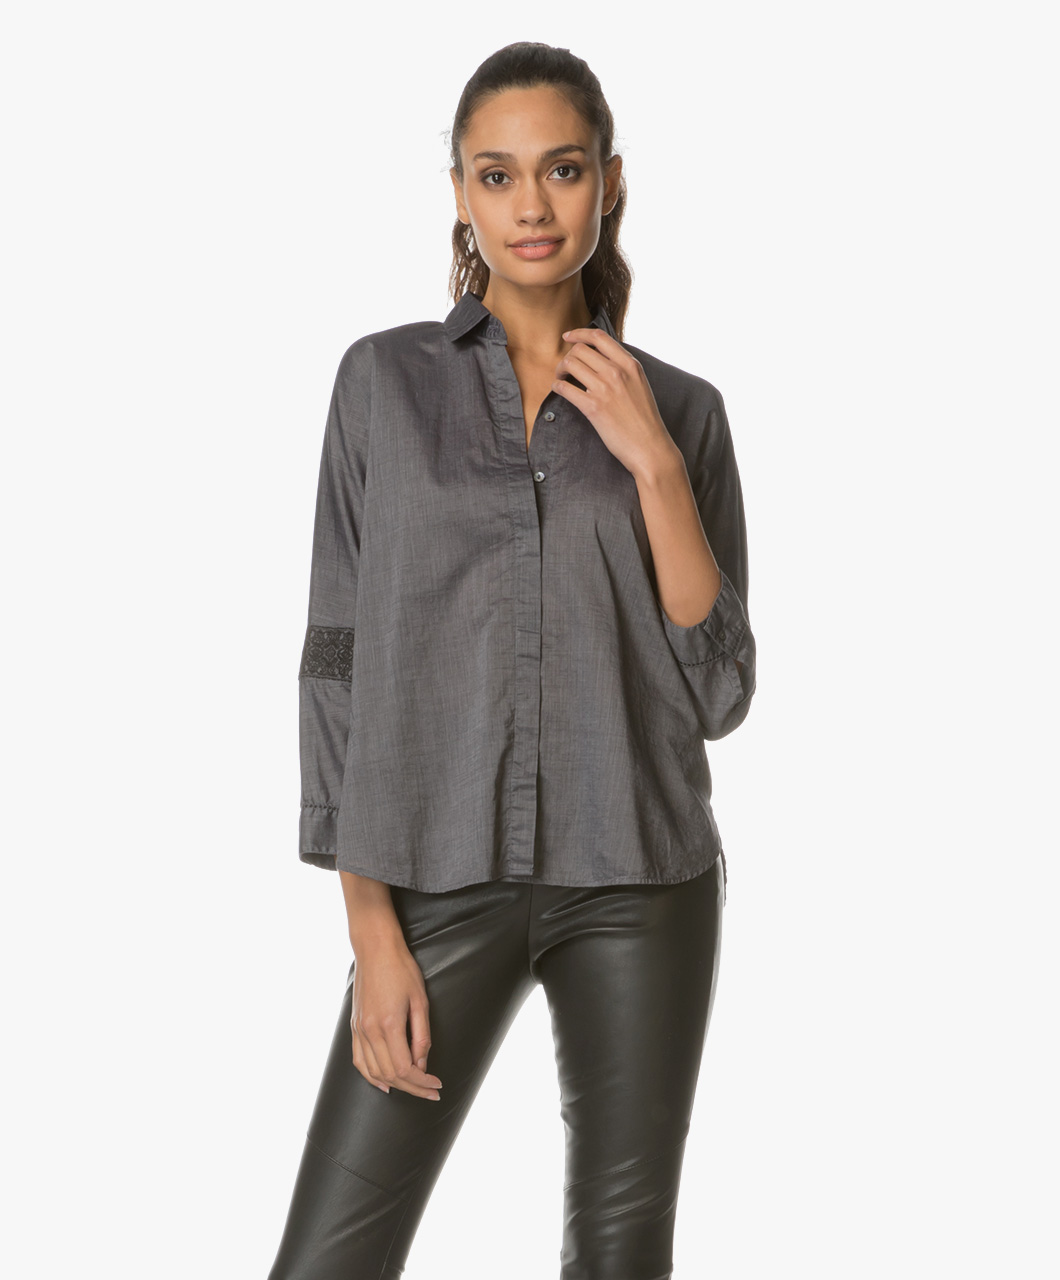 boss orange emaxi blouse met borduursels grijs zwart emaxi 50378008 001. Black Bedroom Furniture Sets. Home Design Ideas